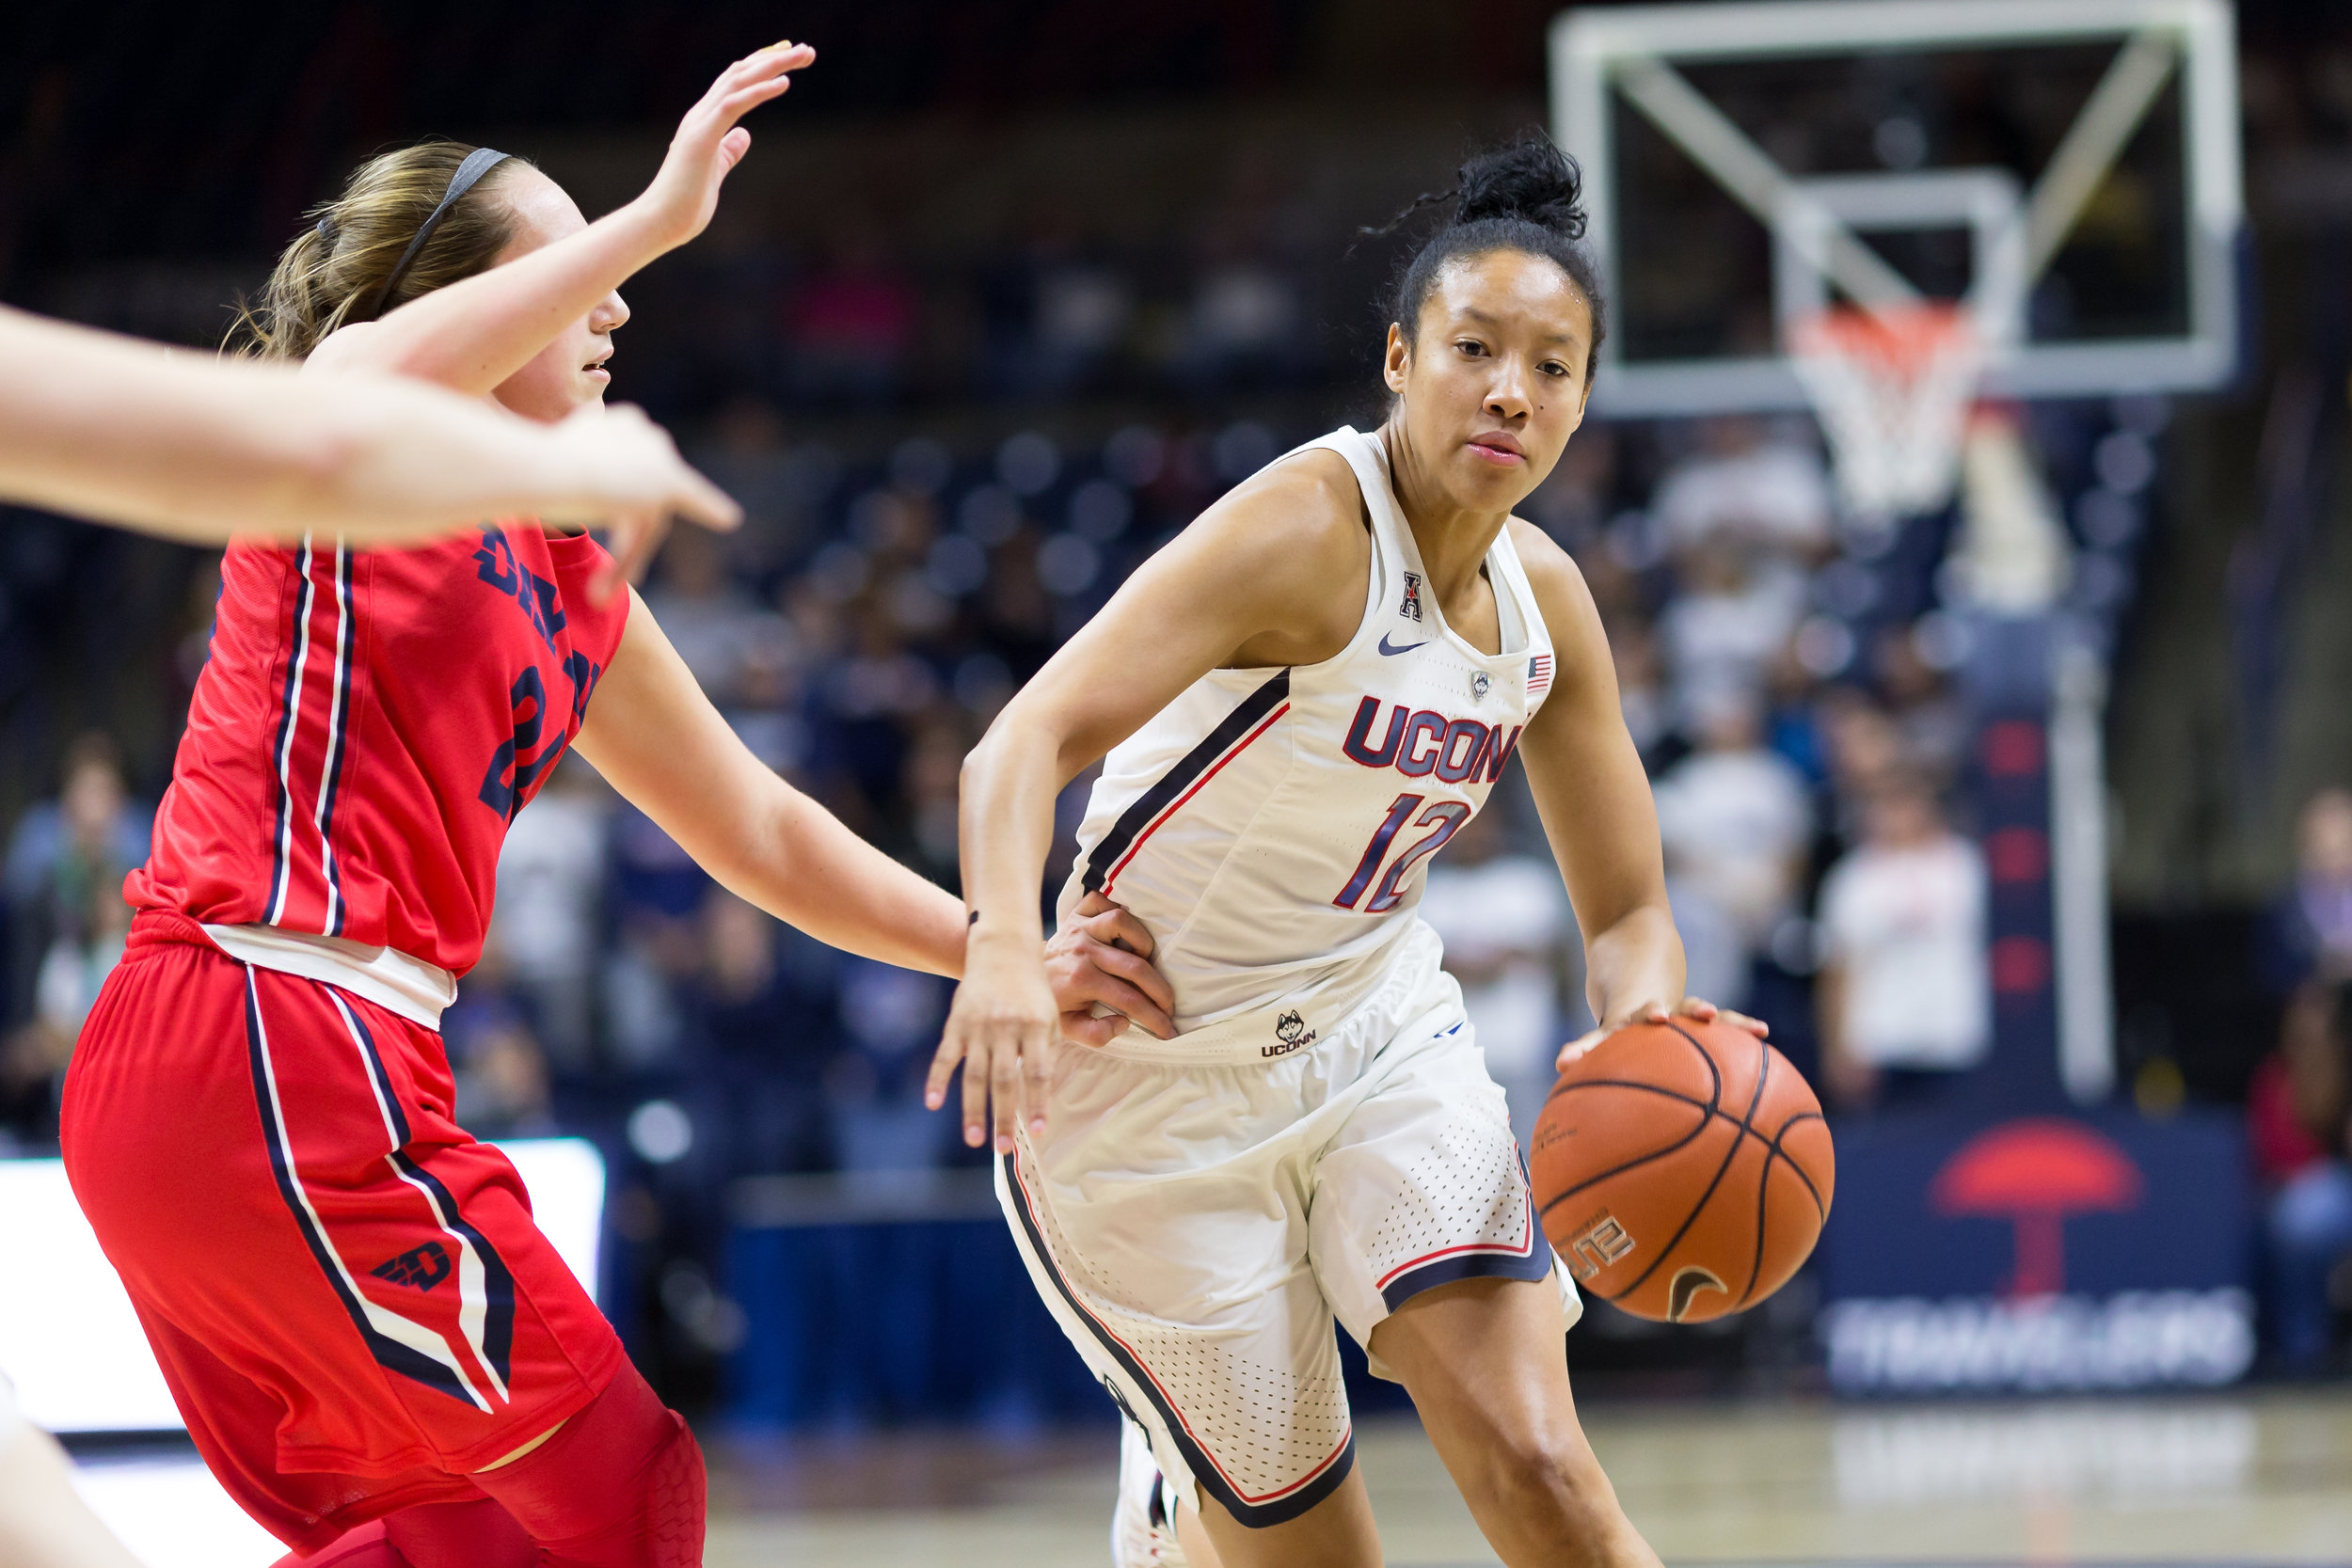 UConn's Saniya Chong dribbles toward the hoop in the Huskies' 98-65 win over Dayton on Nov. 22, 2016 at Gampel Pavilion. (Tyler Benton/The Daily Campus)